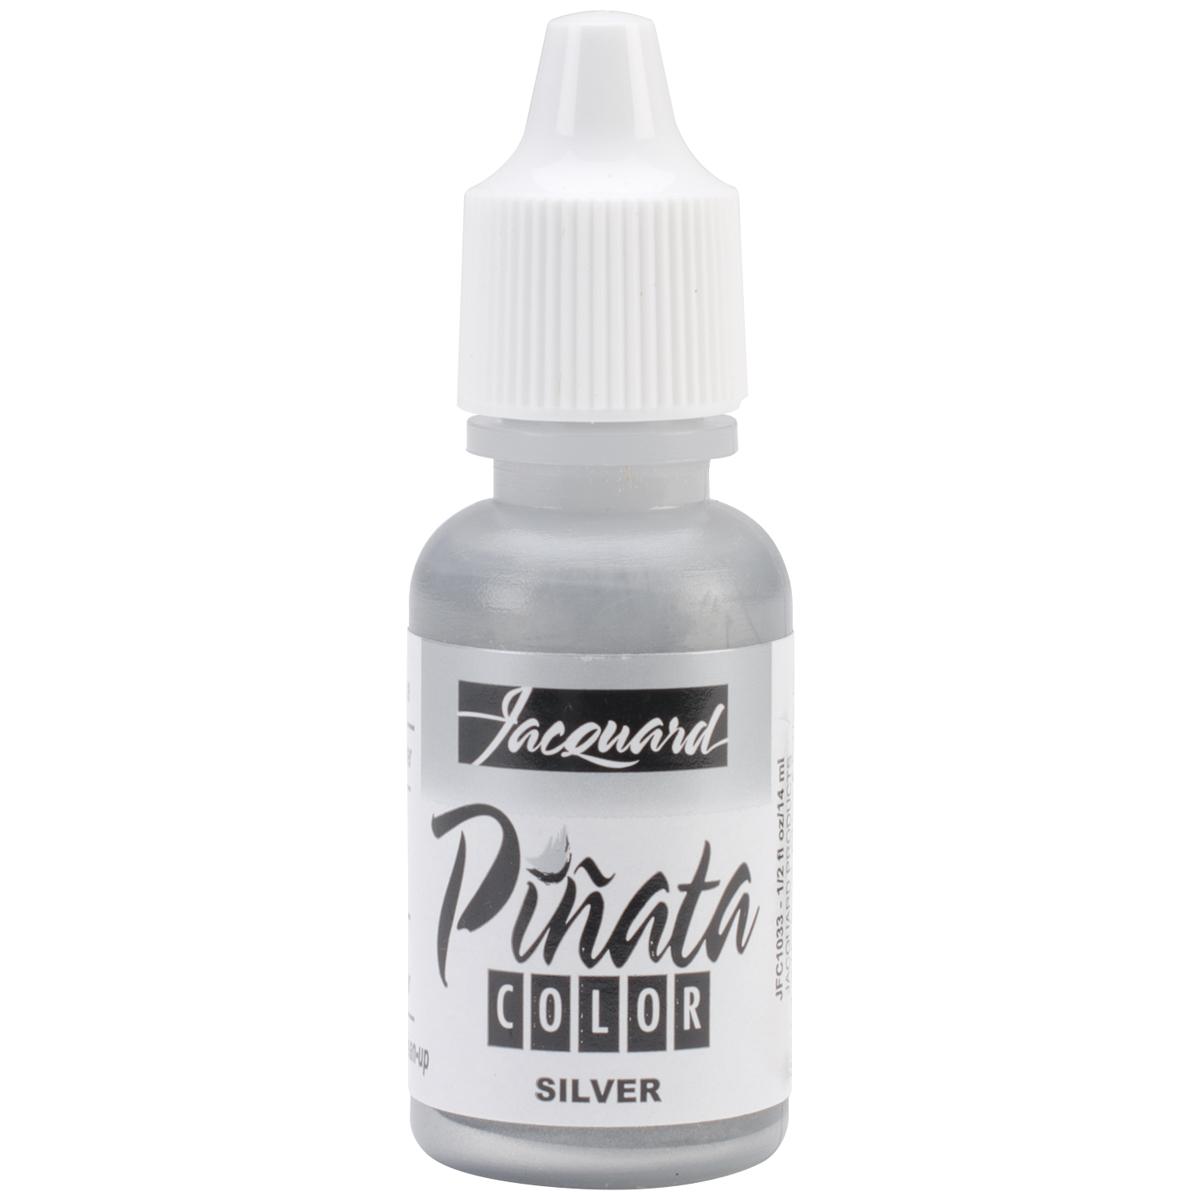 Jacquard Pinata Color Alcohol Ink .5oz-Silver